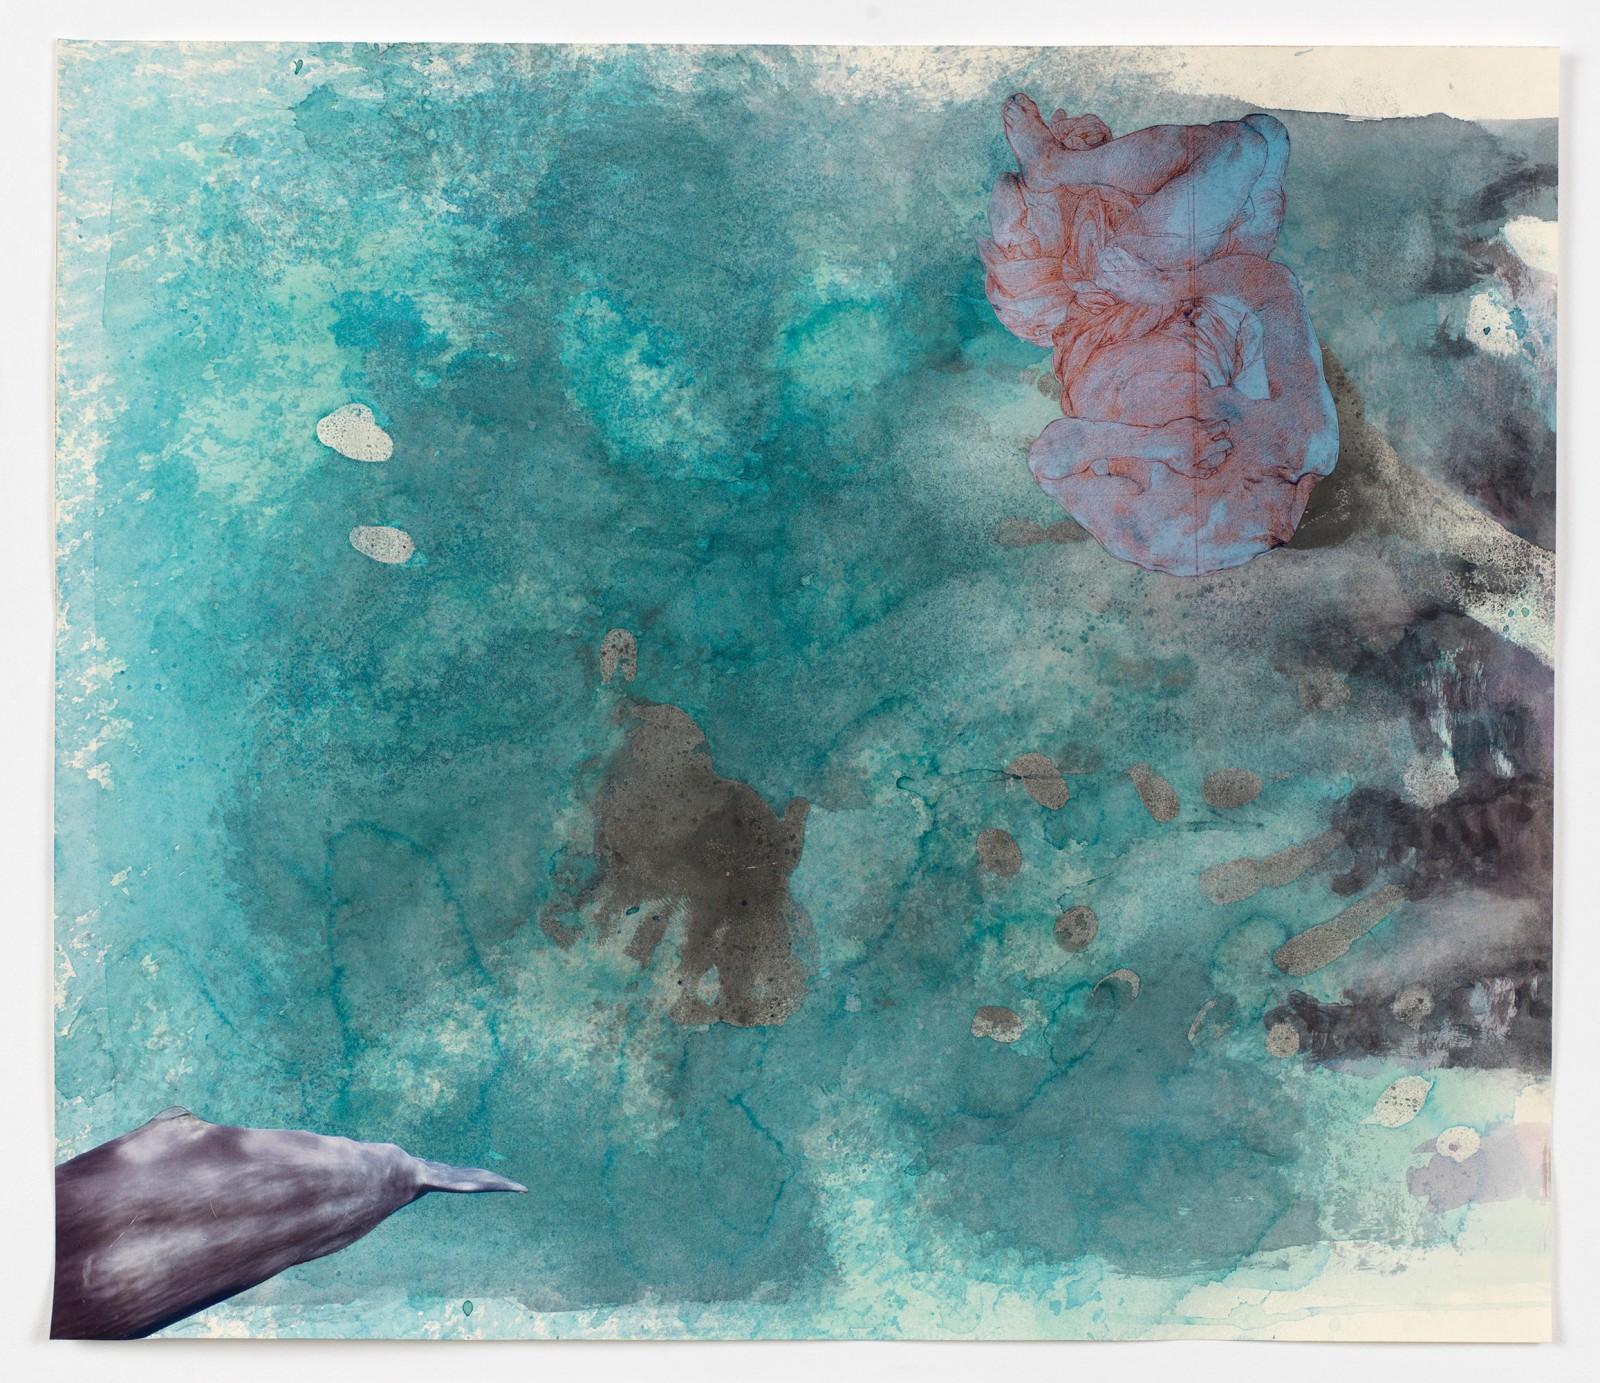 Kim Nekarda: untitled, 2016, body print, photocopy & watercolour on paper, 53 x 61 cm